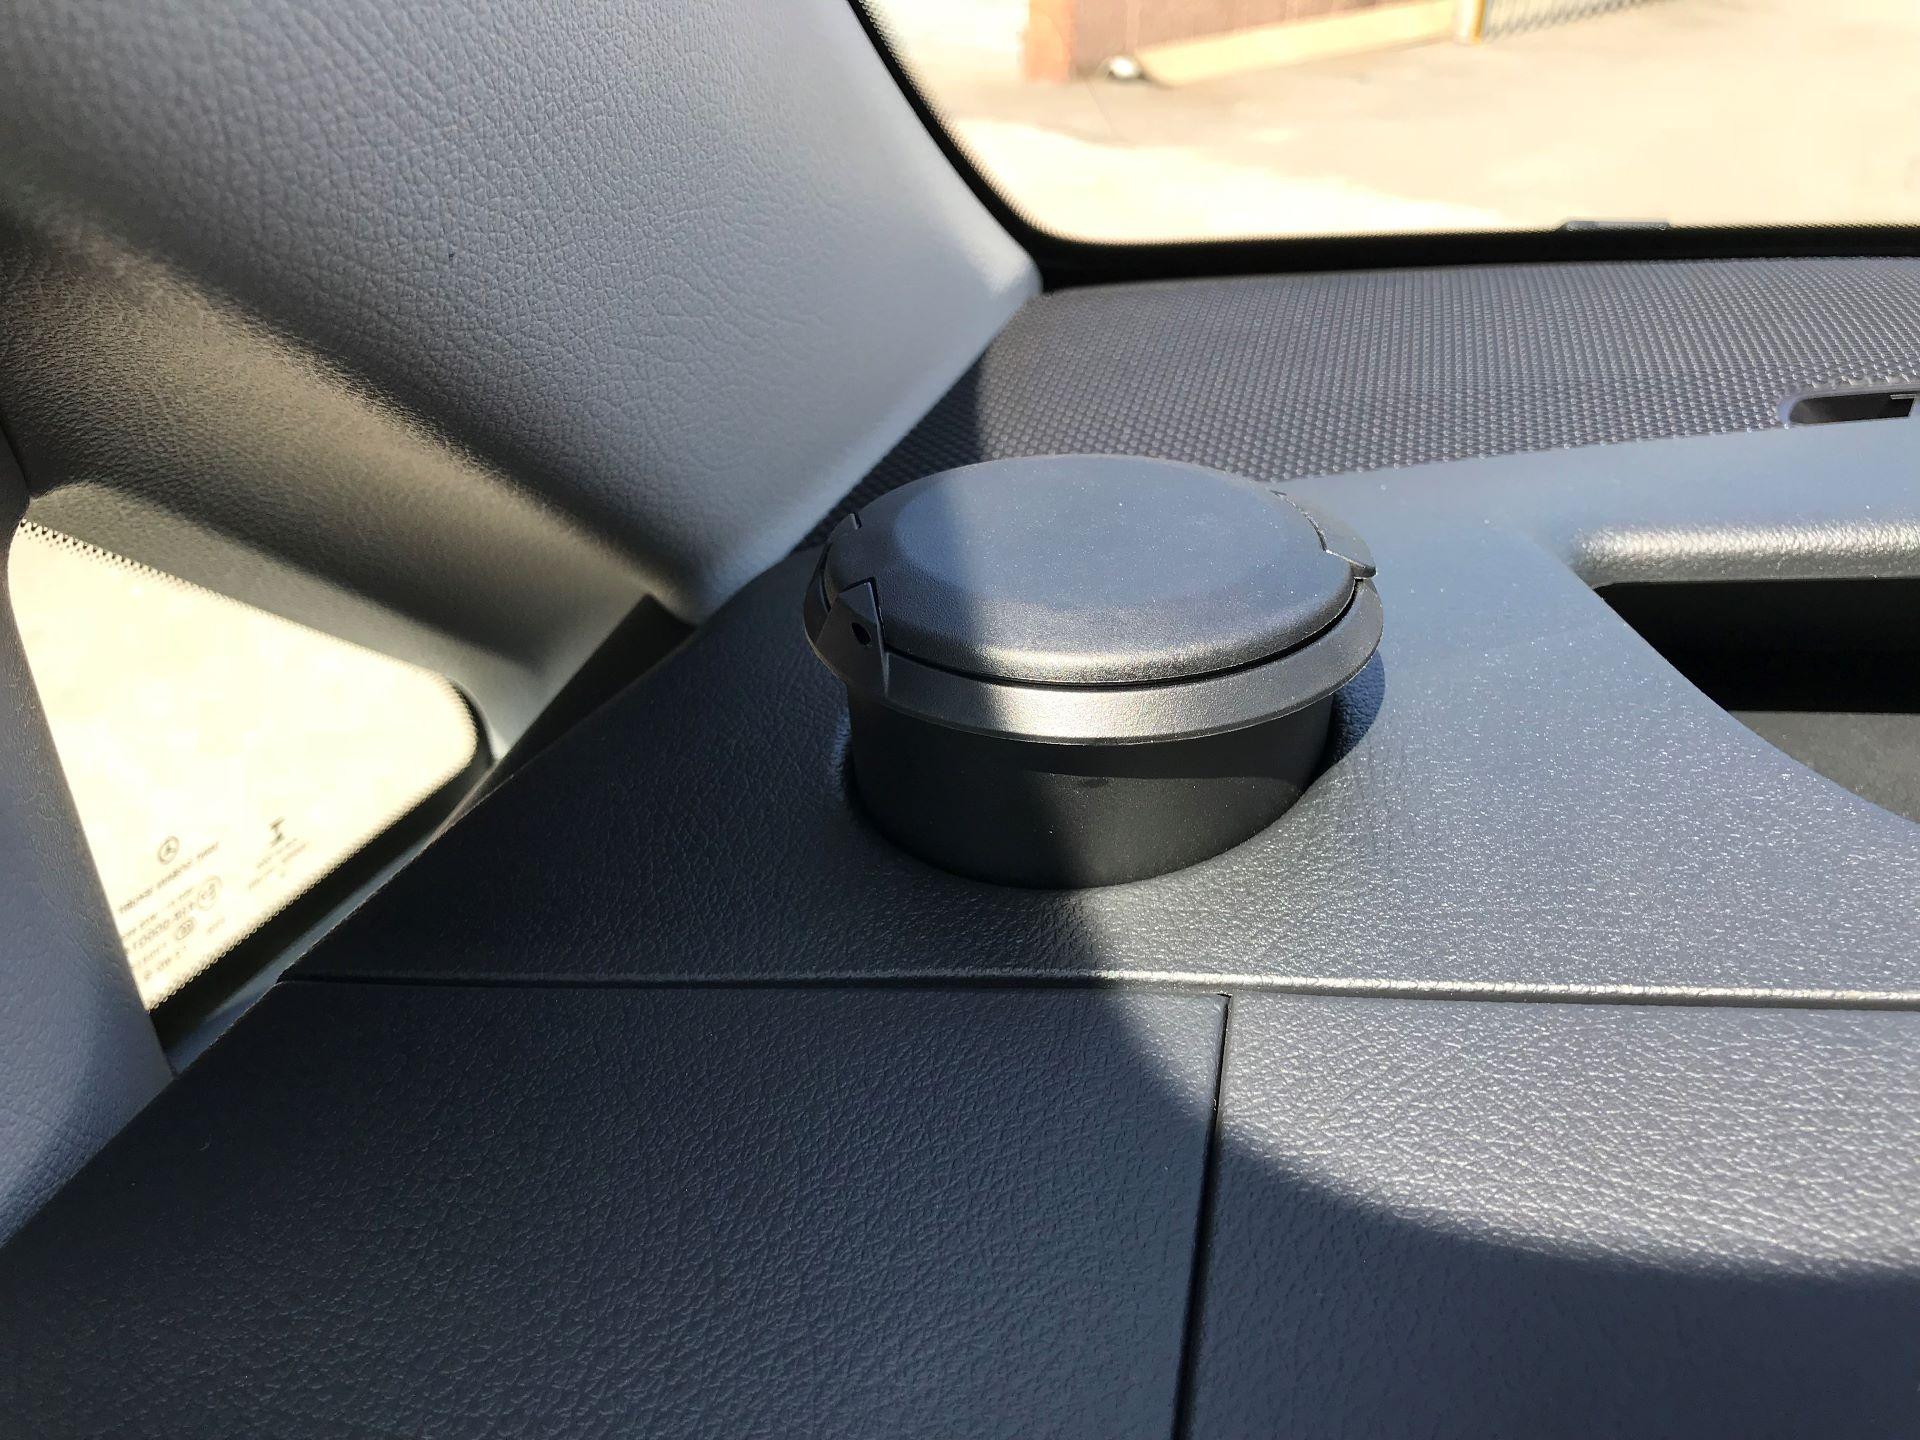 2019 Mercedes-Benz Vito 111CDI LWB 110PS EURO 6, AIR CON (YN19ZGH) Image 25